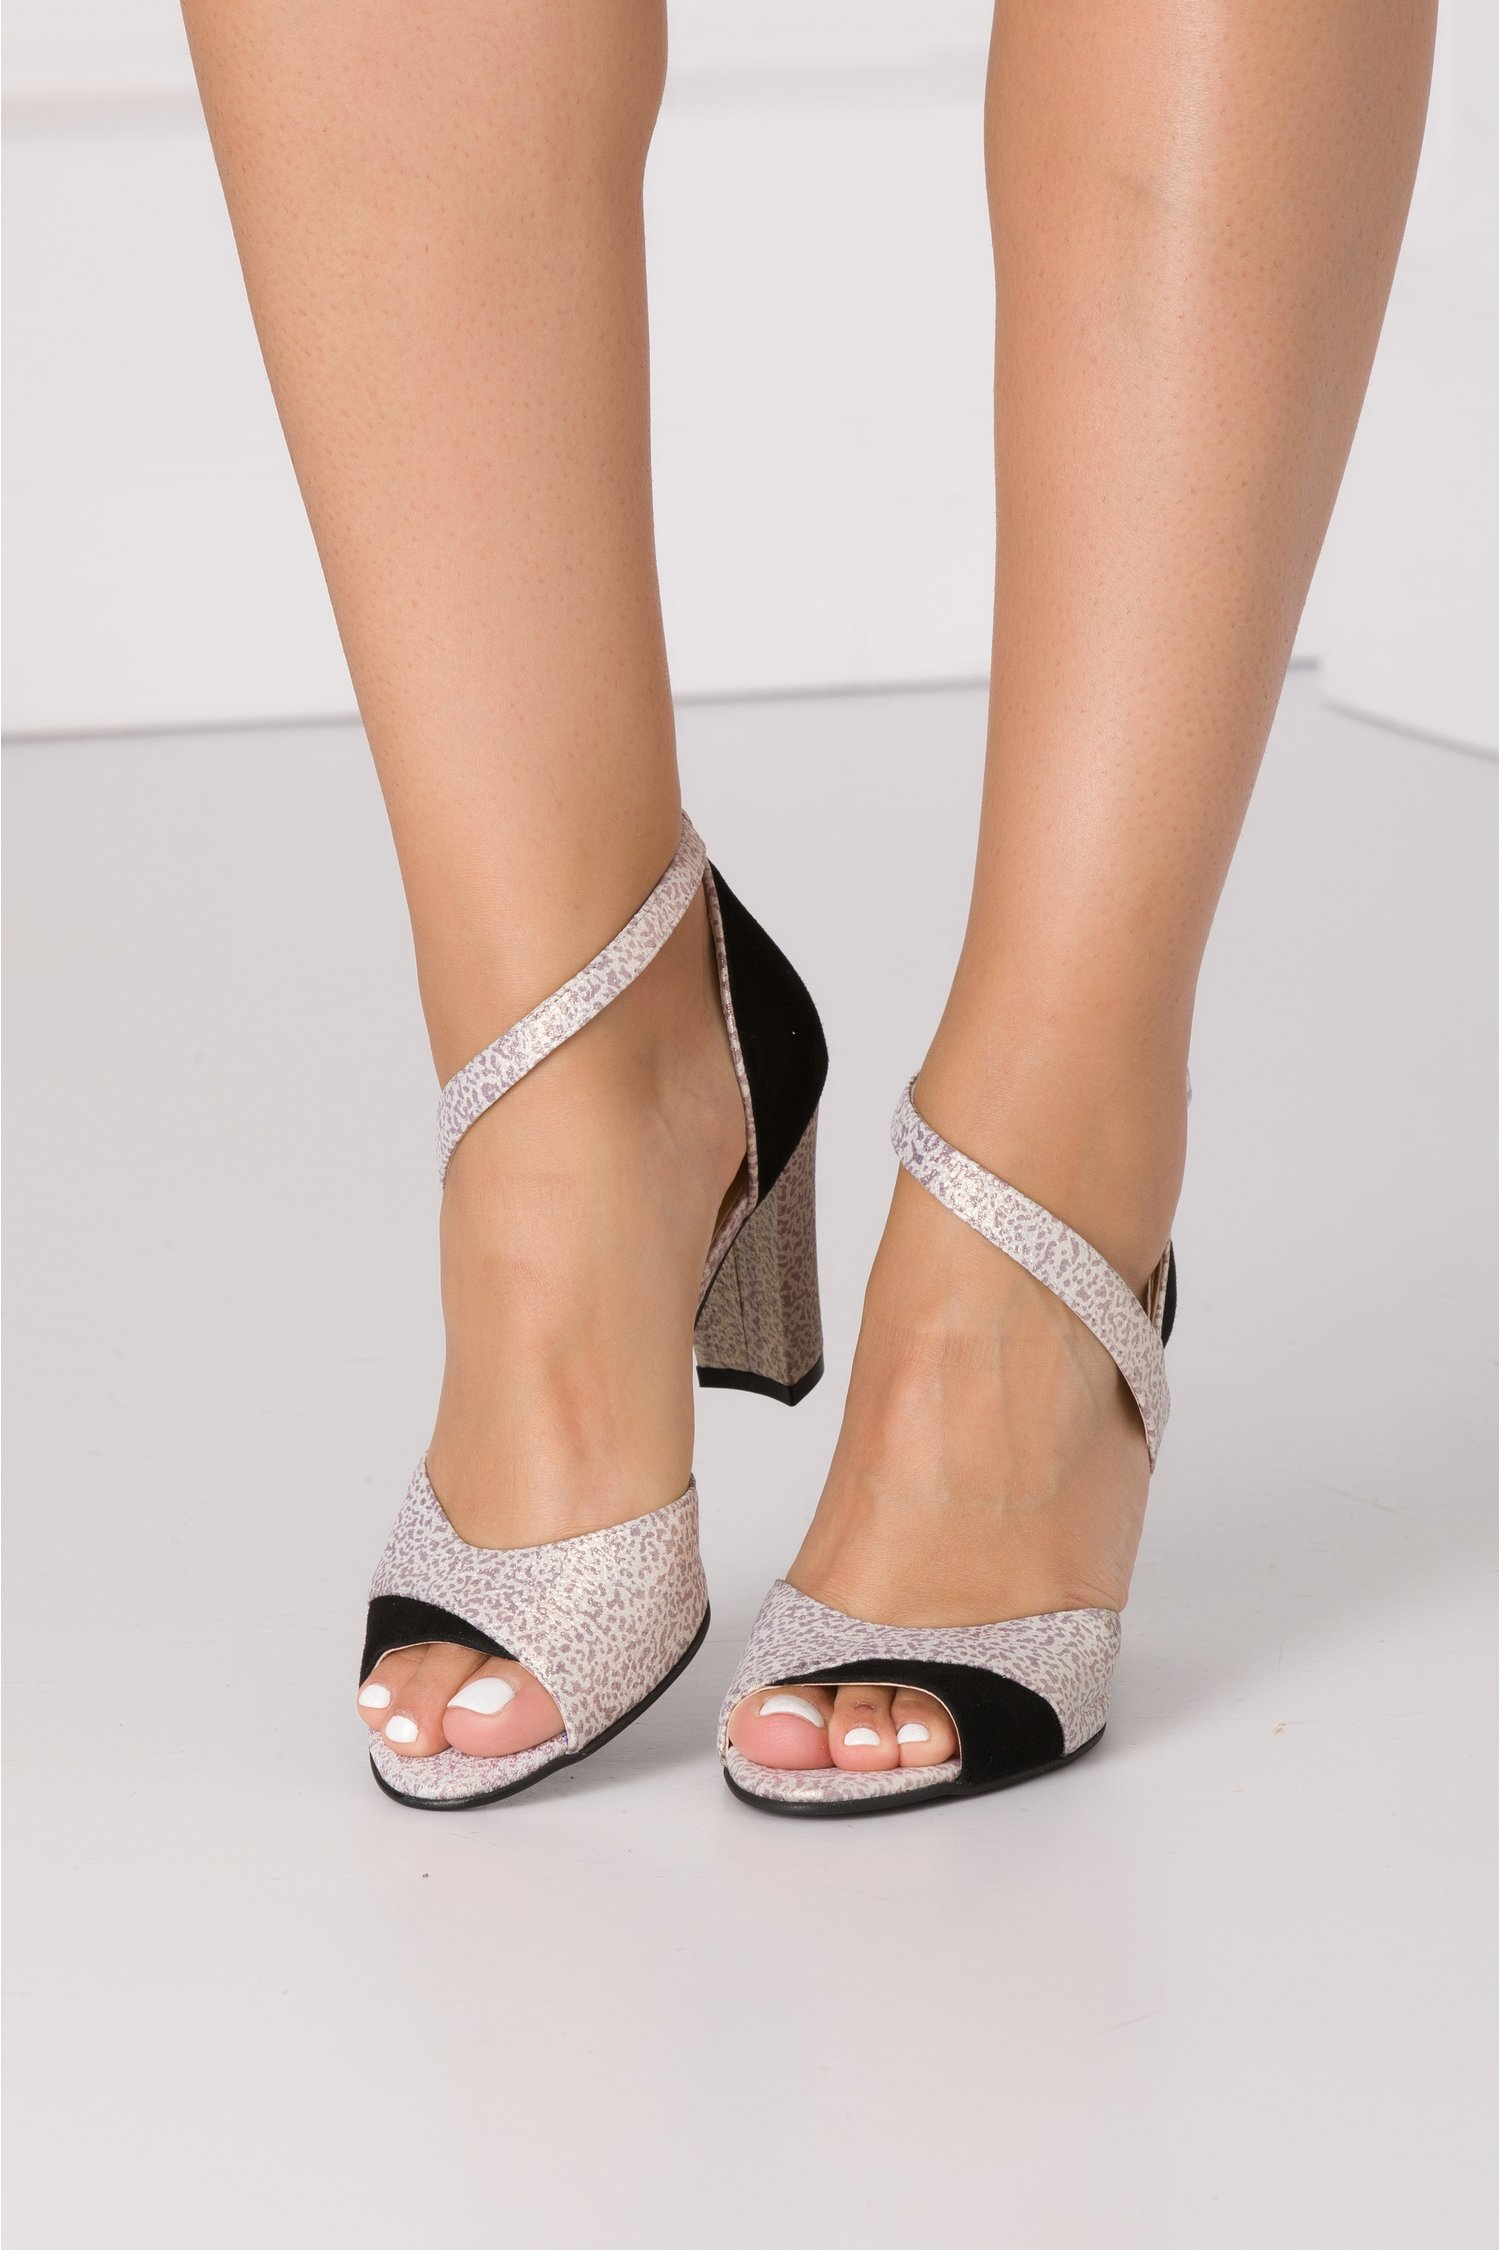 Sandale ivoire cu reflexii aurii si imprimeu cu picatele lila pudrat